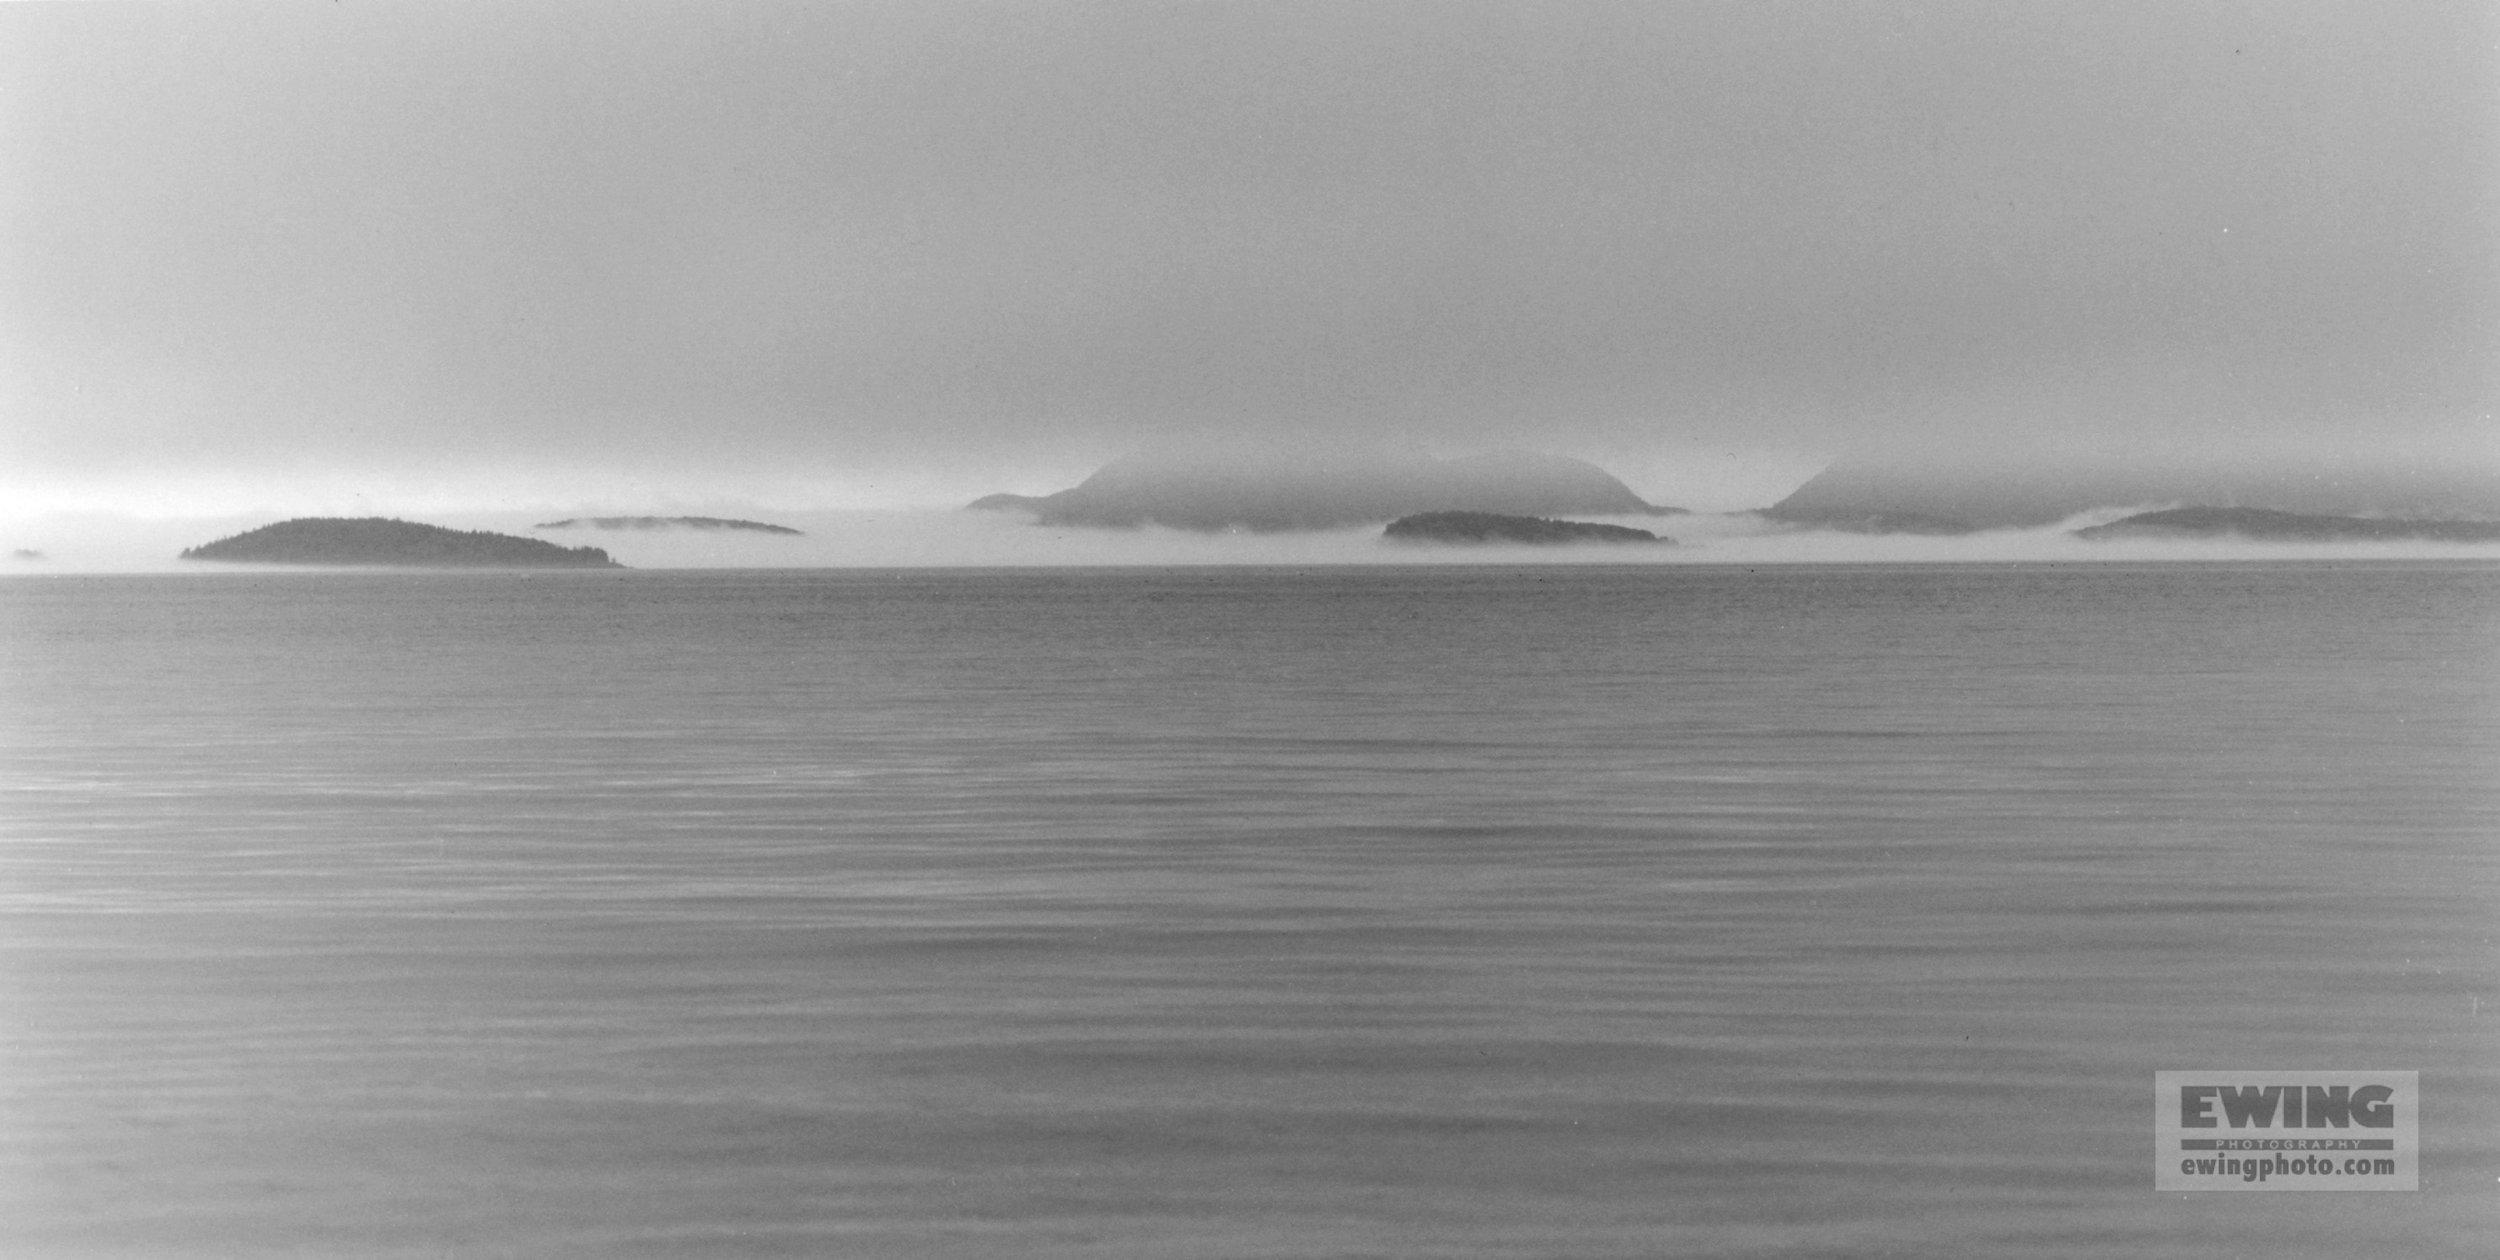 Acadia NP. Frenchman Bay